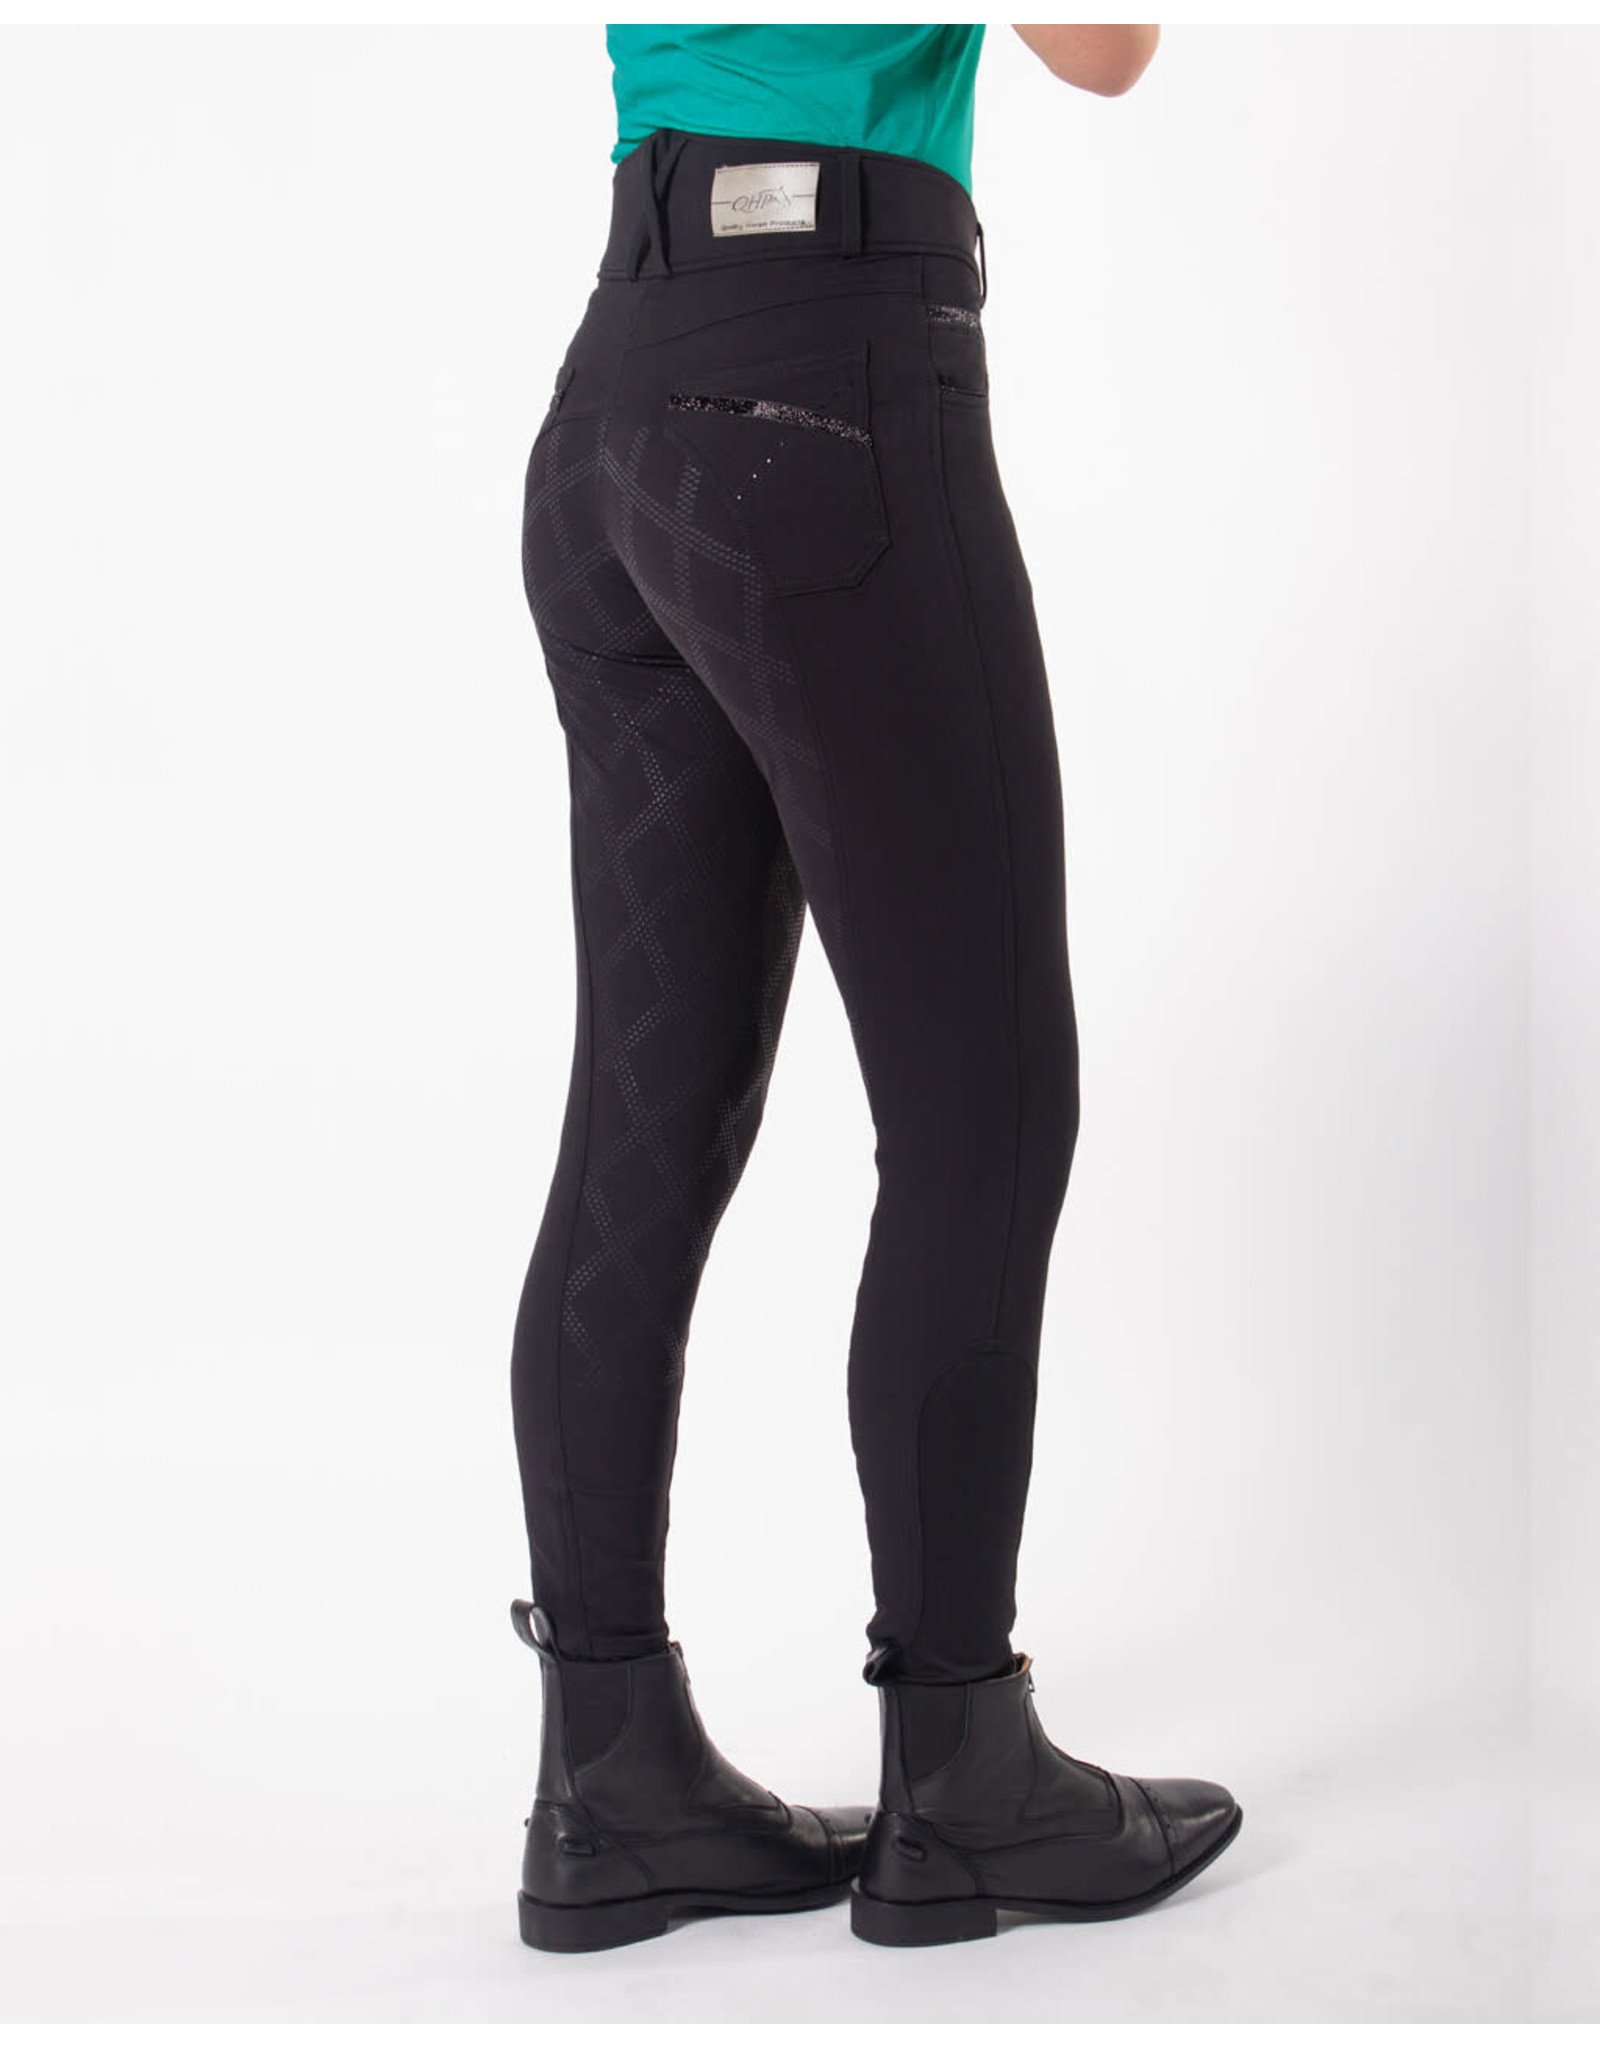 QHP QHP Rijbroek Liva anti-slip zitvlak Zwart